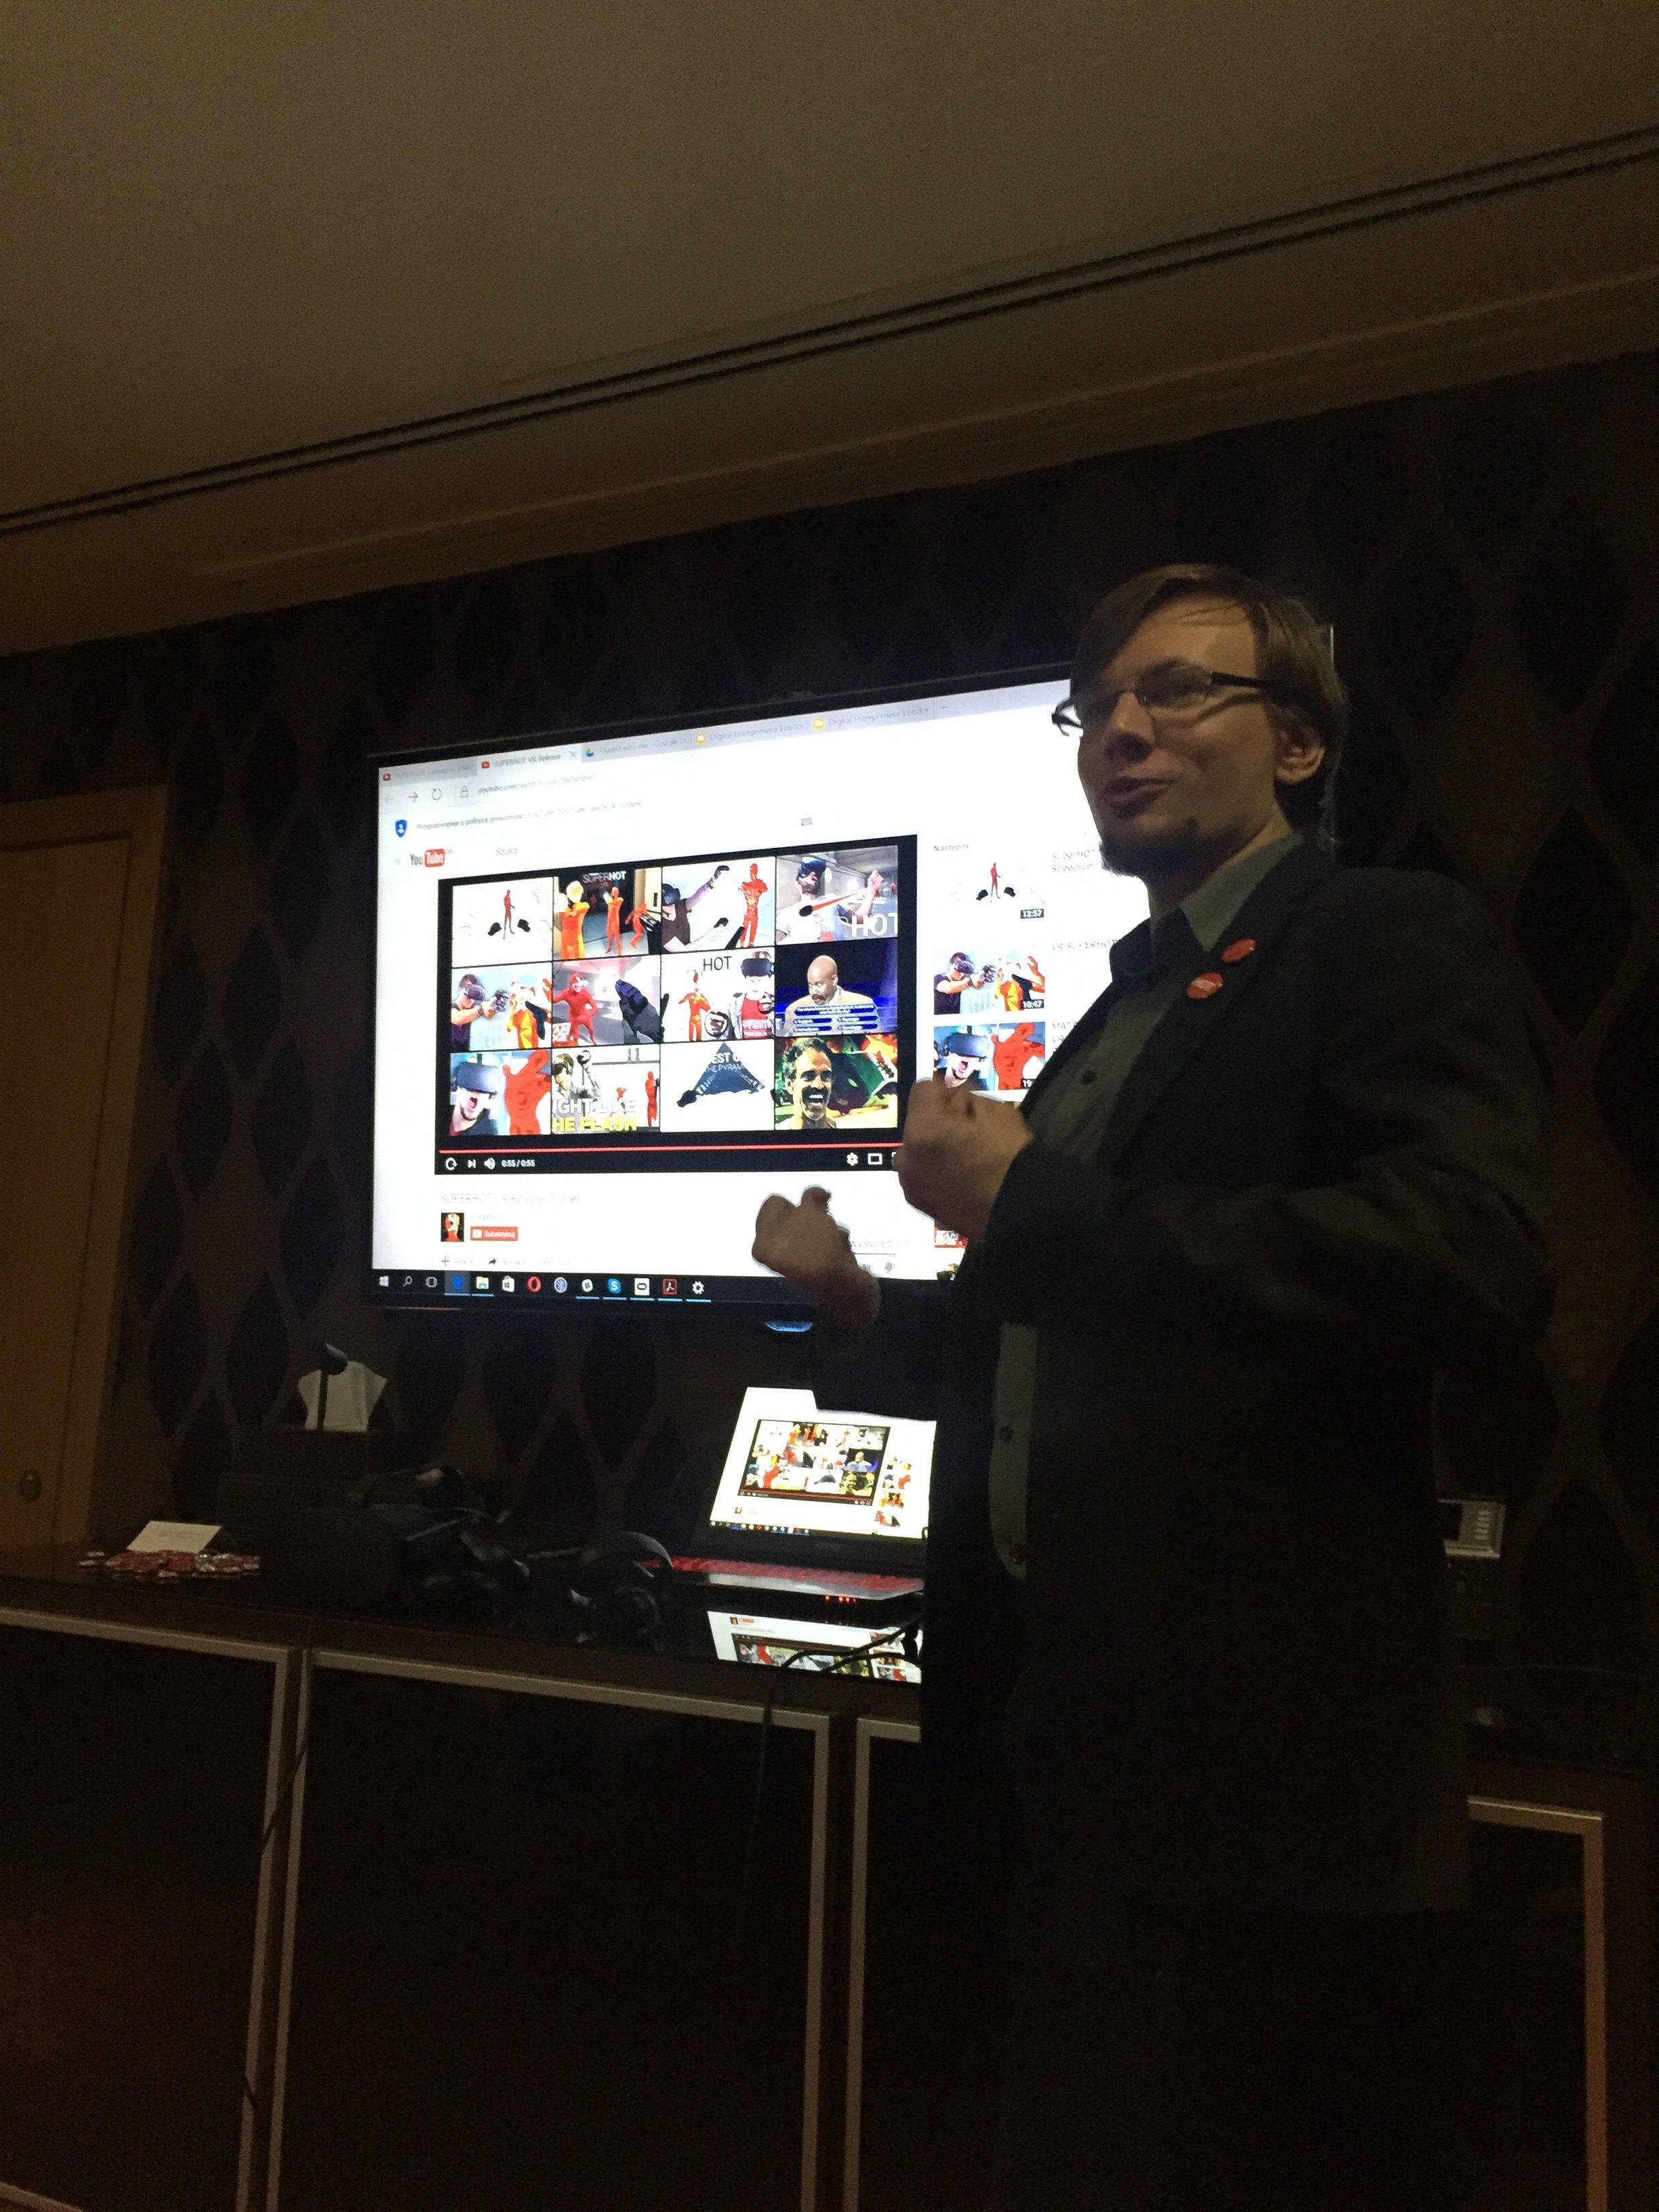 Our Keynote Speaker: Tomasz Kaczmarczyk, talking passionately about SUPERHOT with Oculus Rift.